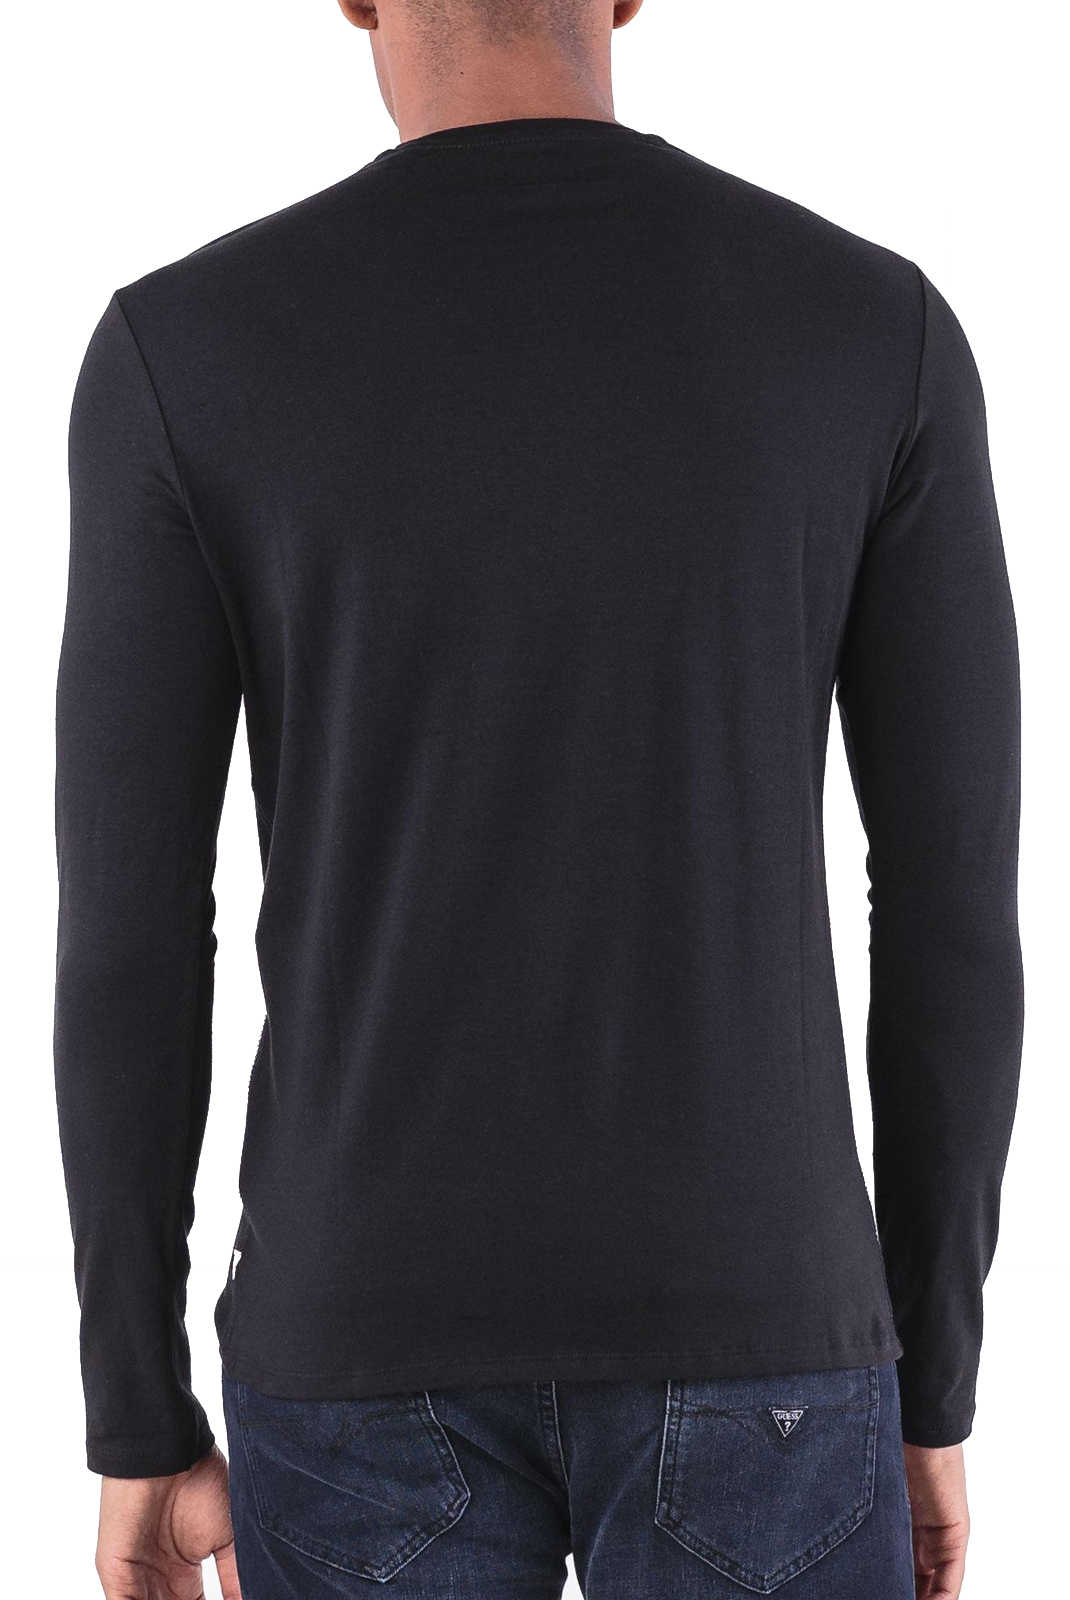 Tee-shirts  Guess jeans M84I17 J1300 Jet Black A996